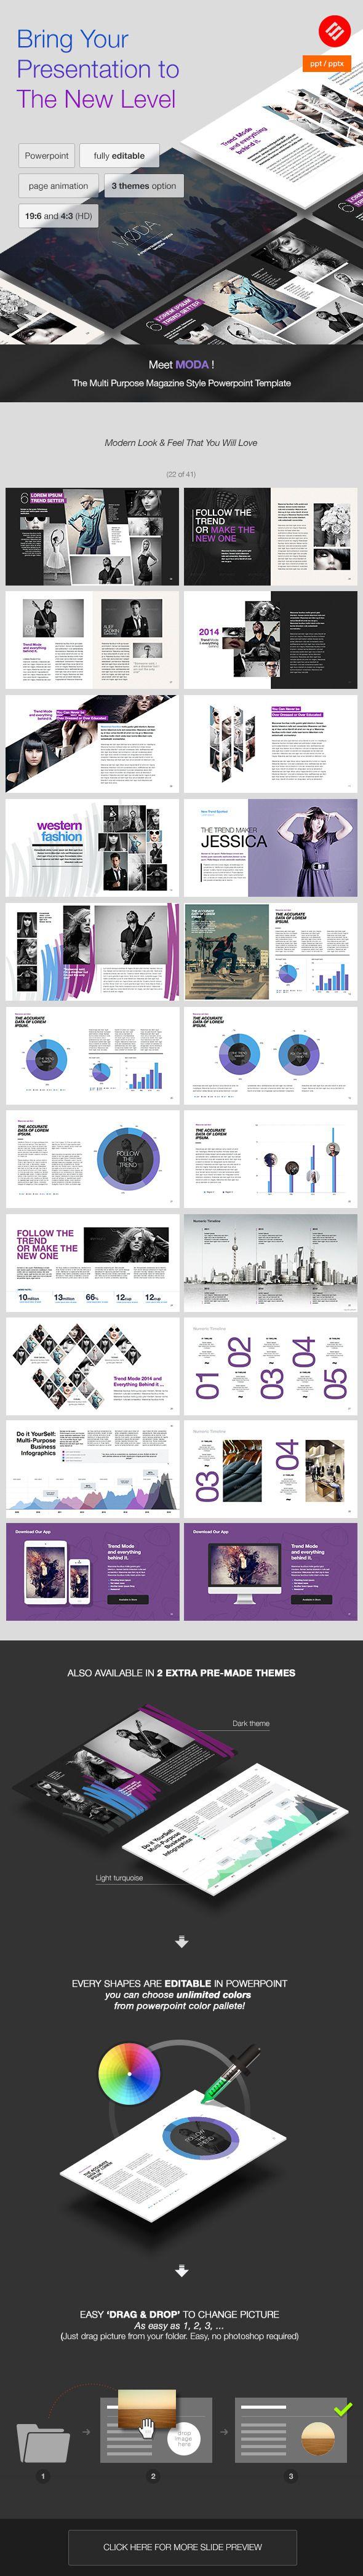 MODA - Modern Powerpoint Template PowerPoint Template / Theme / Presentation / Slides / Background / Power Point #powerpoint #template #theme